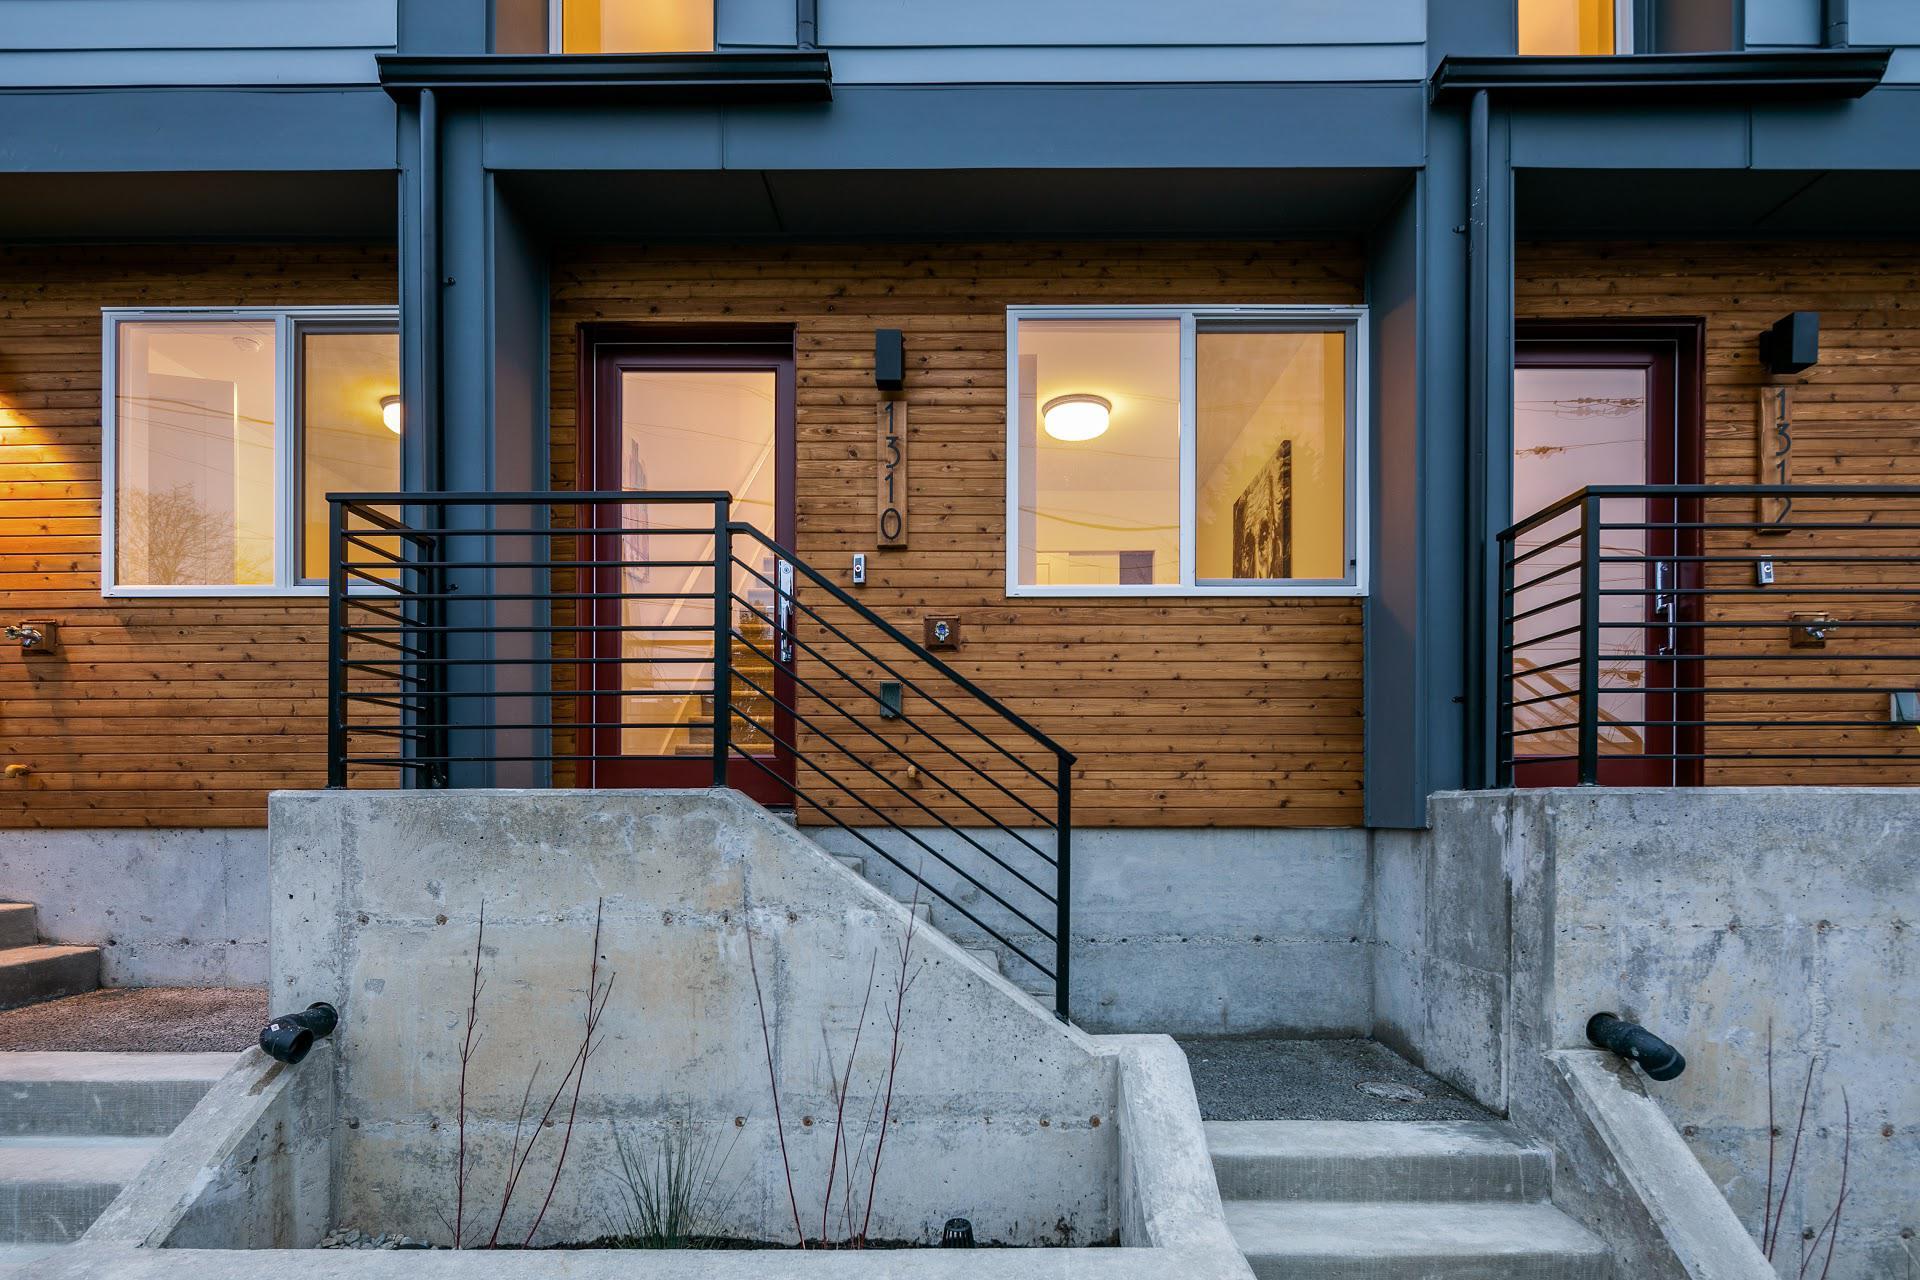 exterior photo of row house